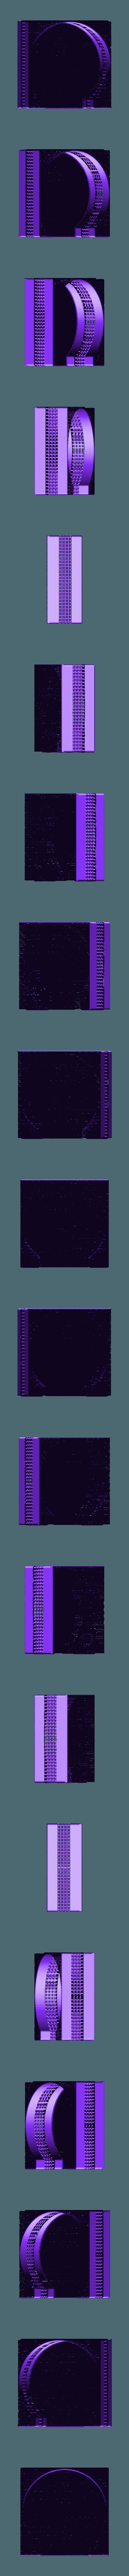 coasterholder lattice v6.stl Download free STL file Coasterholder lattice pattern • 3D printer template, IdeaLab